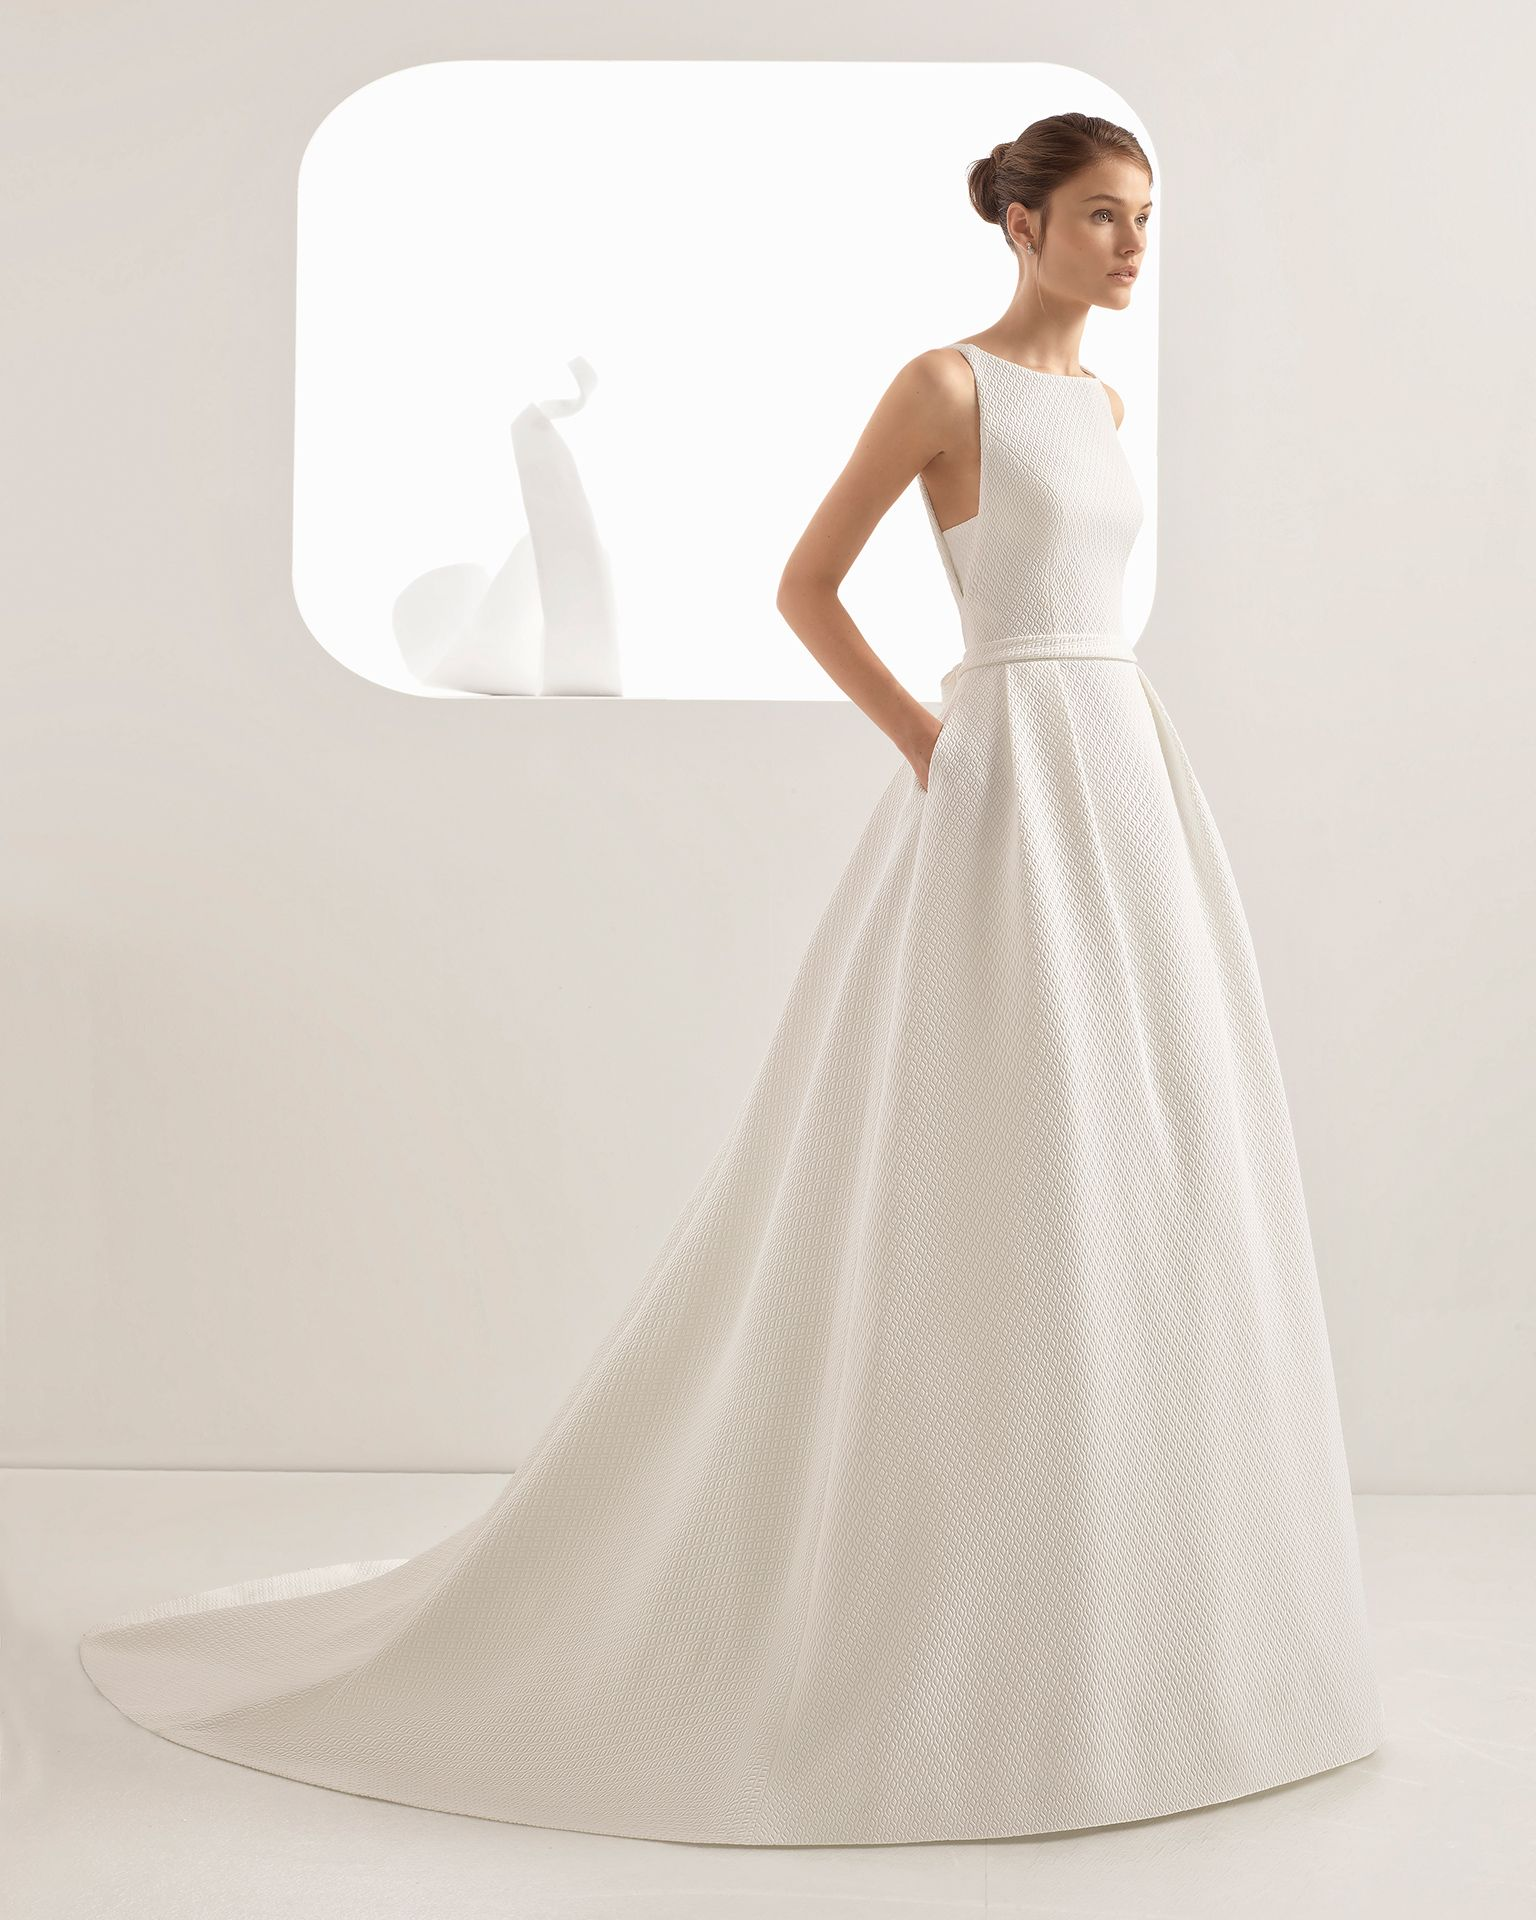 Wedding Dresses New 2020 Collection Elegant Wedding Dress Wedding Dresses Bridal Dresses,Wedding Day Jennifer Lawrence Wedding Dress Dior